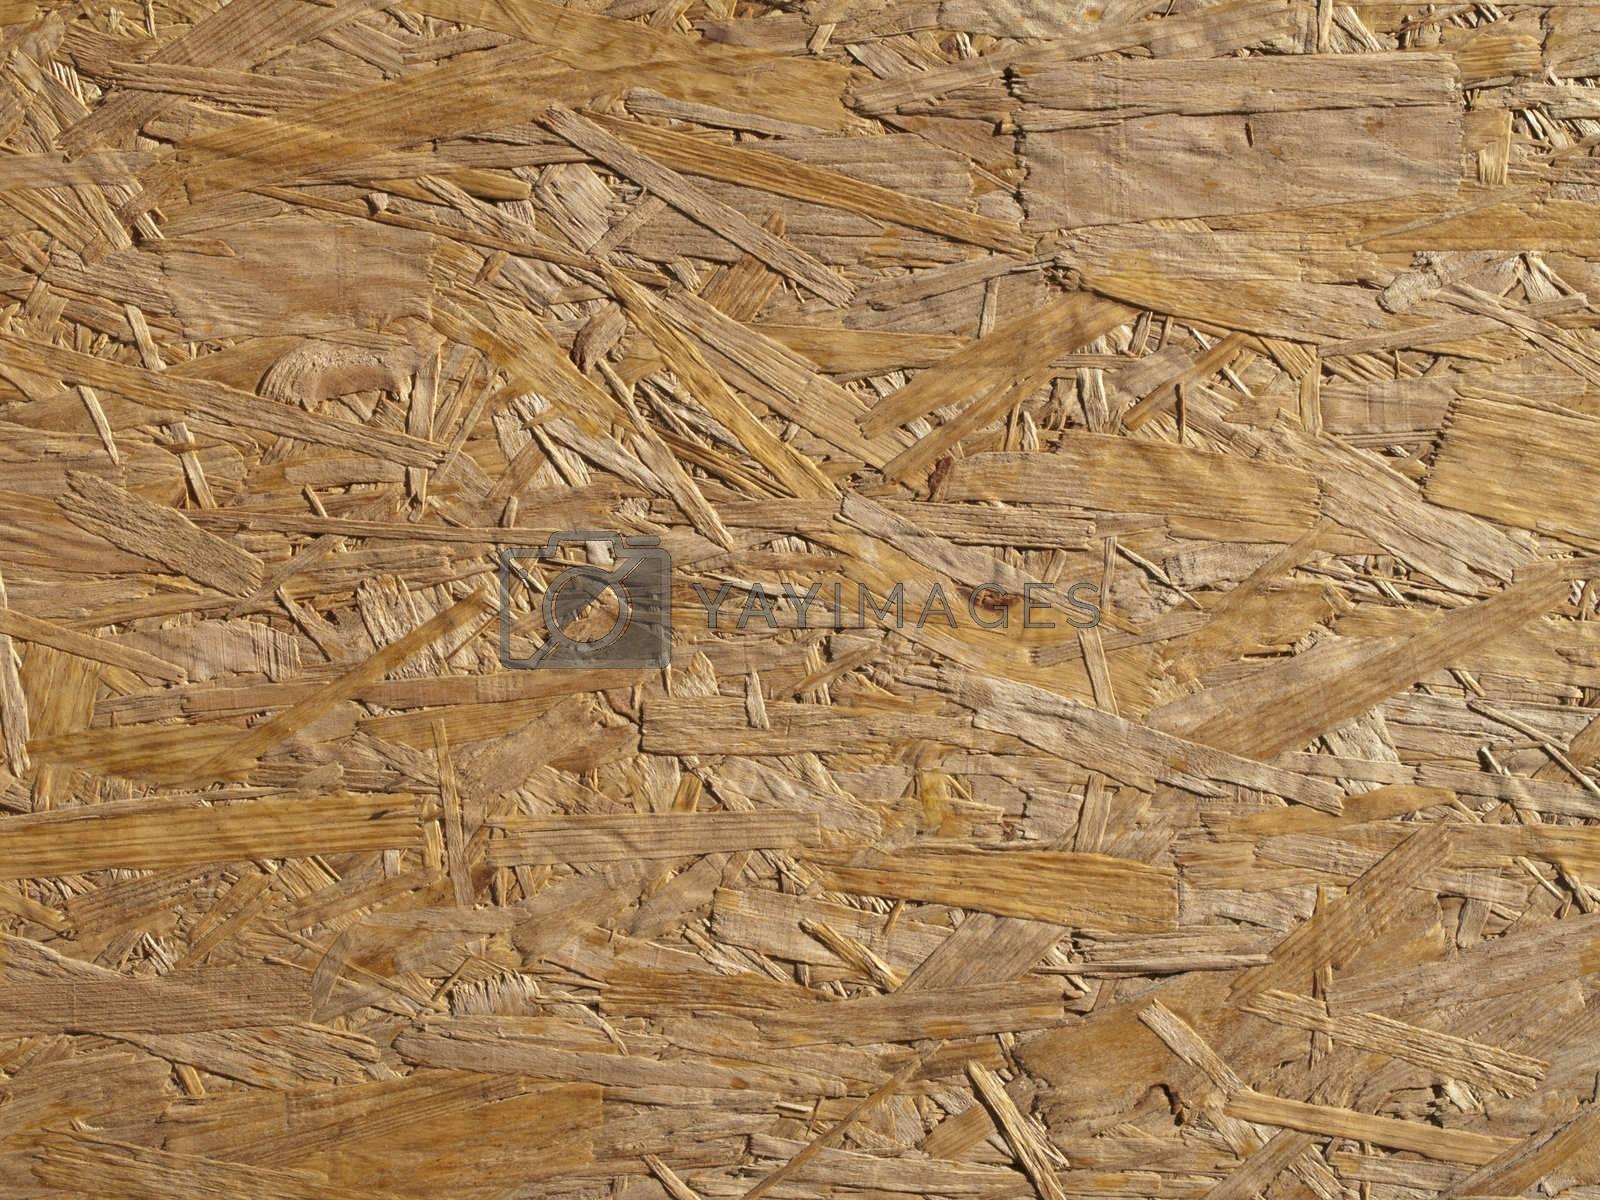 A wood texture